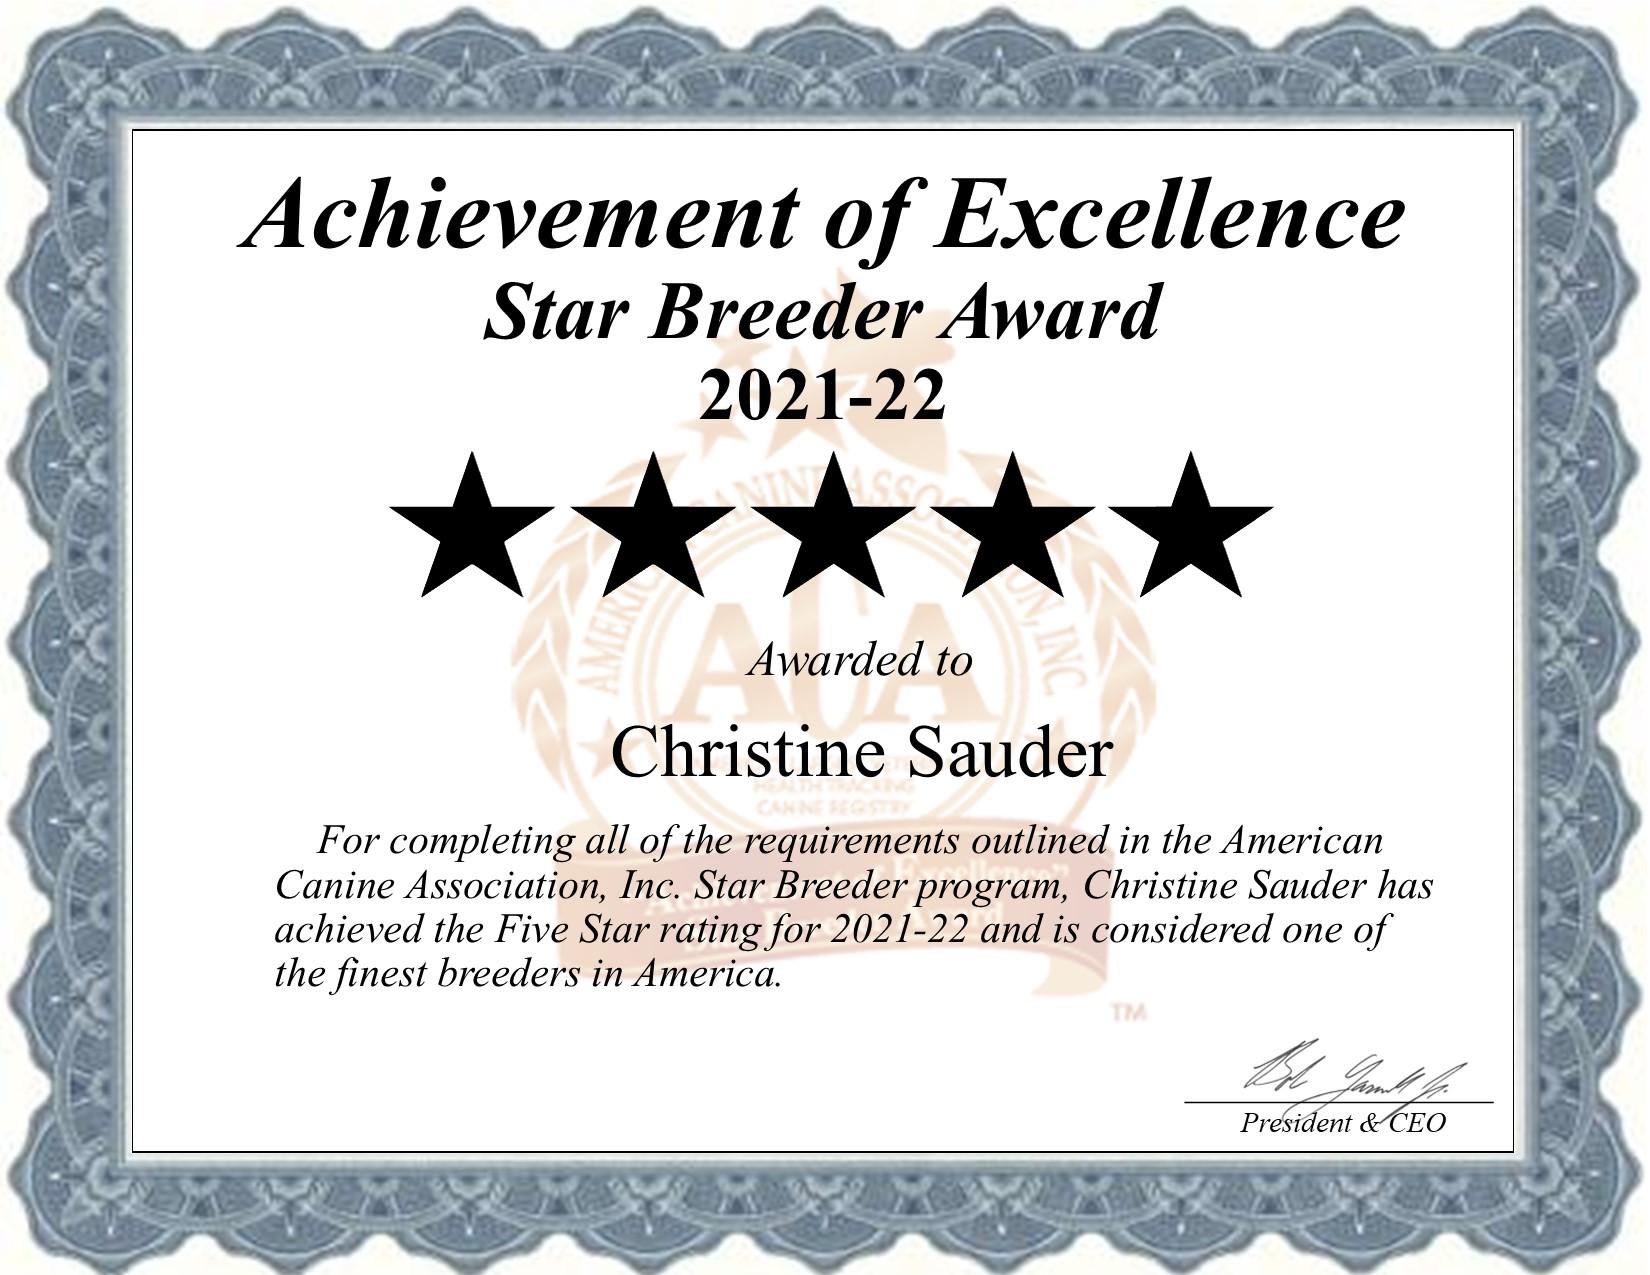 Christine, Sauder, dog, breeder, star, certificate, Christine-Sauder, Denver, PA, Pennsylvania, puppy, dog, kennels, mill, puppymill, usda, 5-star, aca, ica, registered, cocker, spaniel, maltese, 2021-22